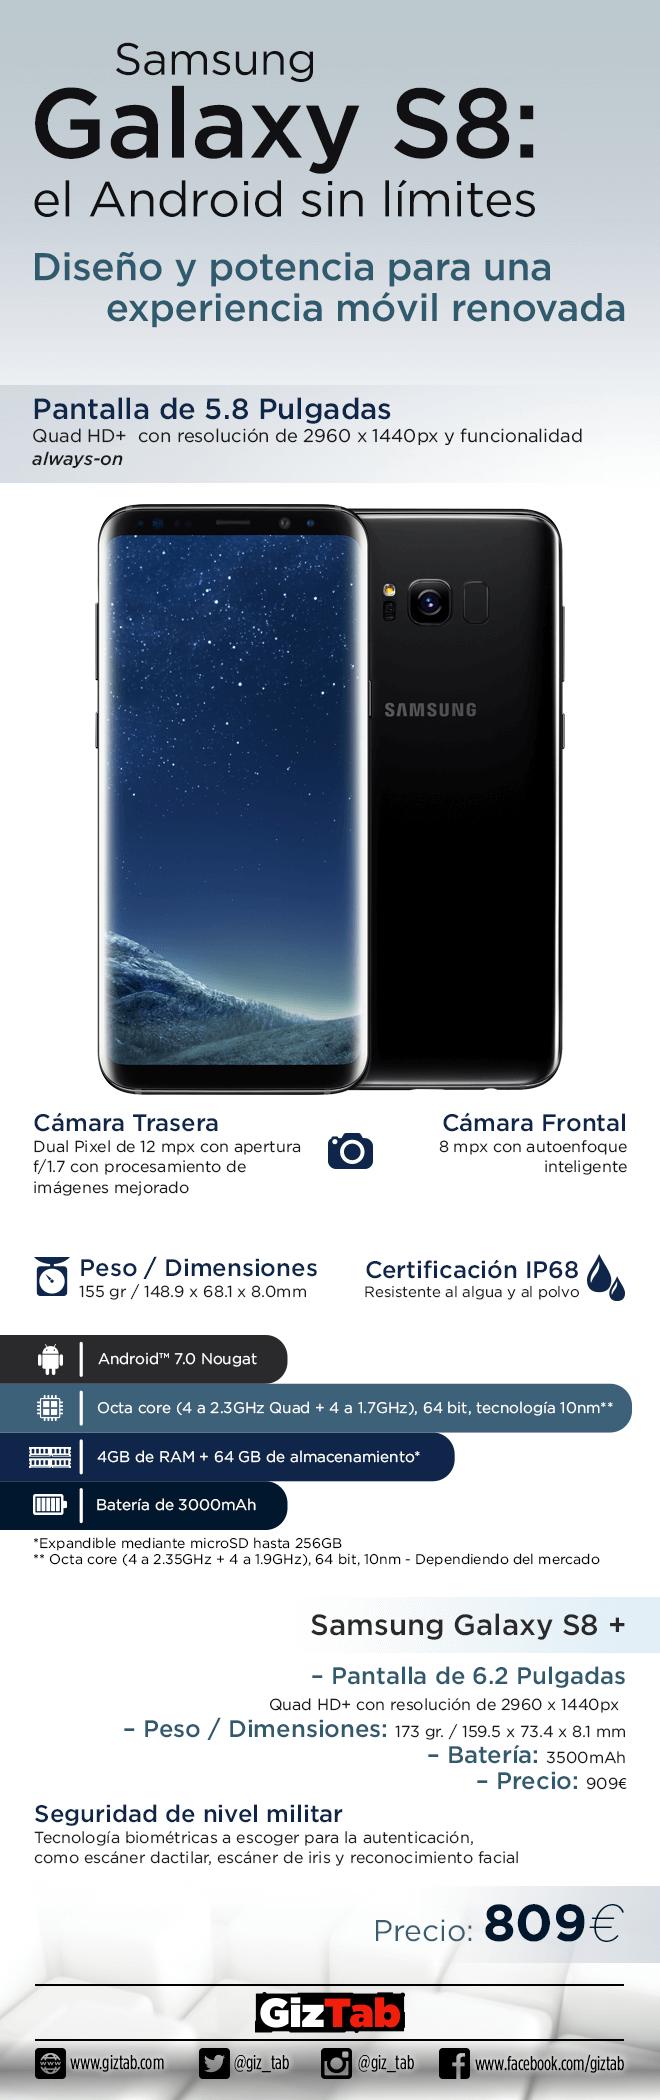 Infografía Samsung Galaxy S8